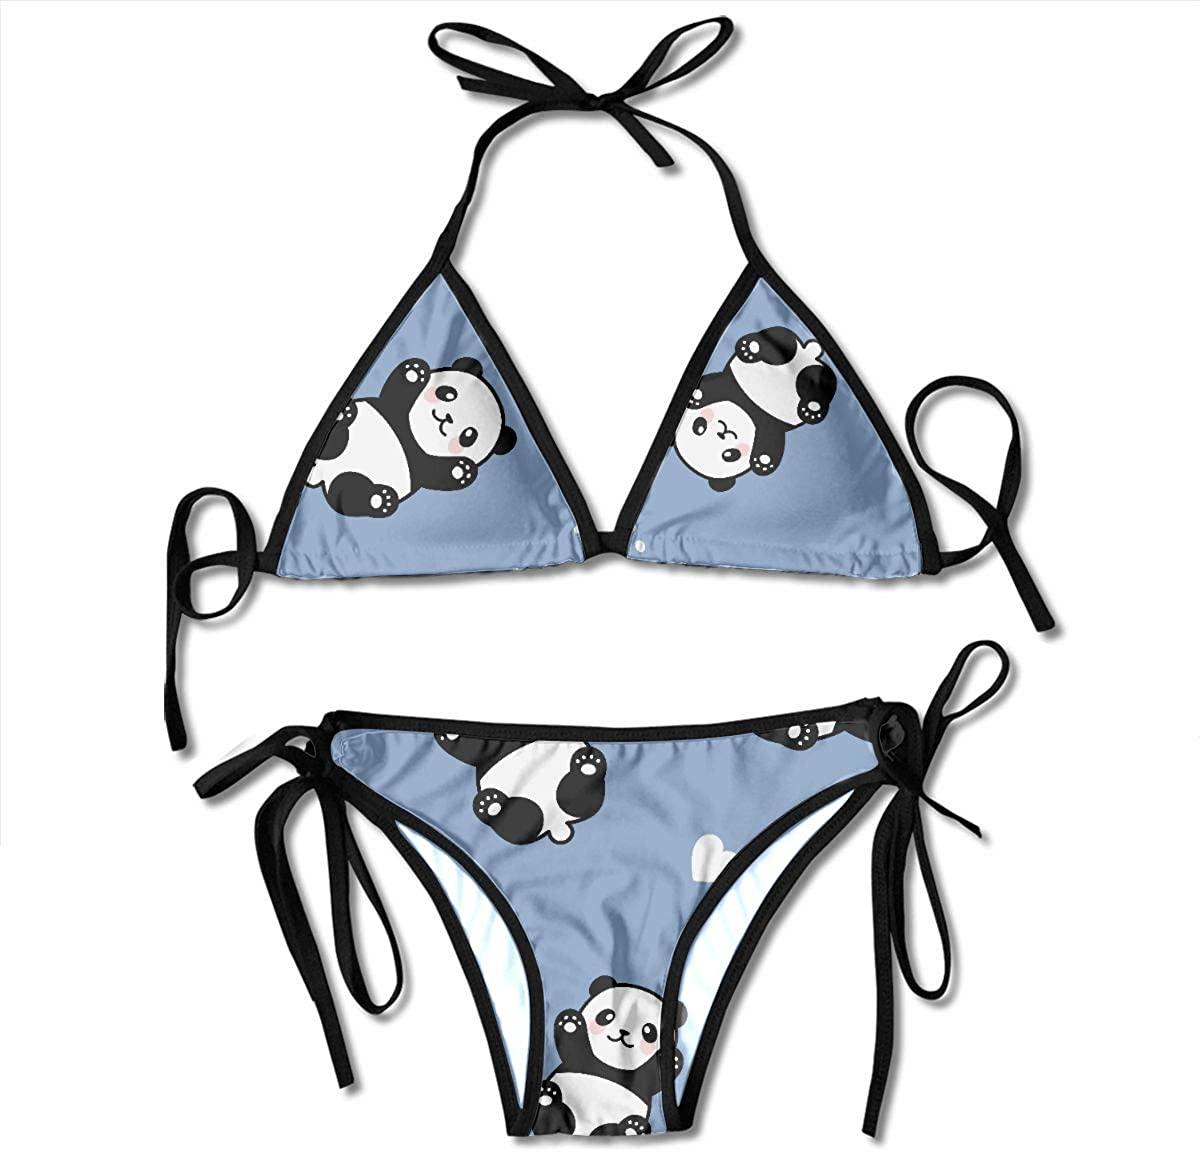 Xuyonh Women Bathing Suits Chinese Cute Small Panda for Child Padded Bikinis Set Summer Two Piece Swimsuit Bathing Suits Beach Swimwear for Women Lady Fun Swimsuits for Women